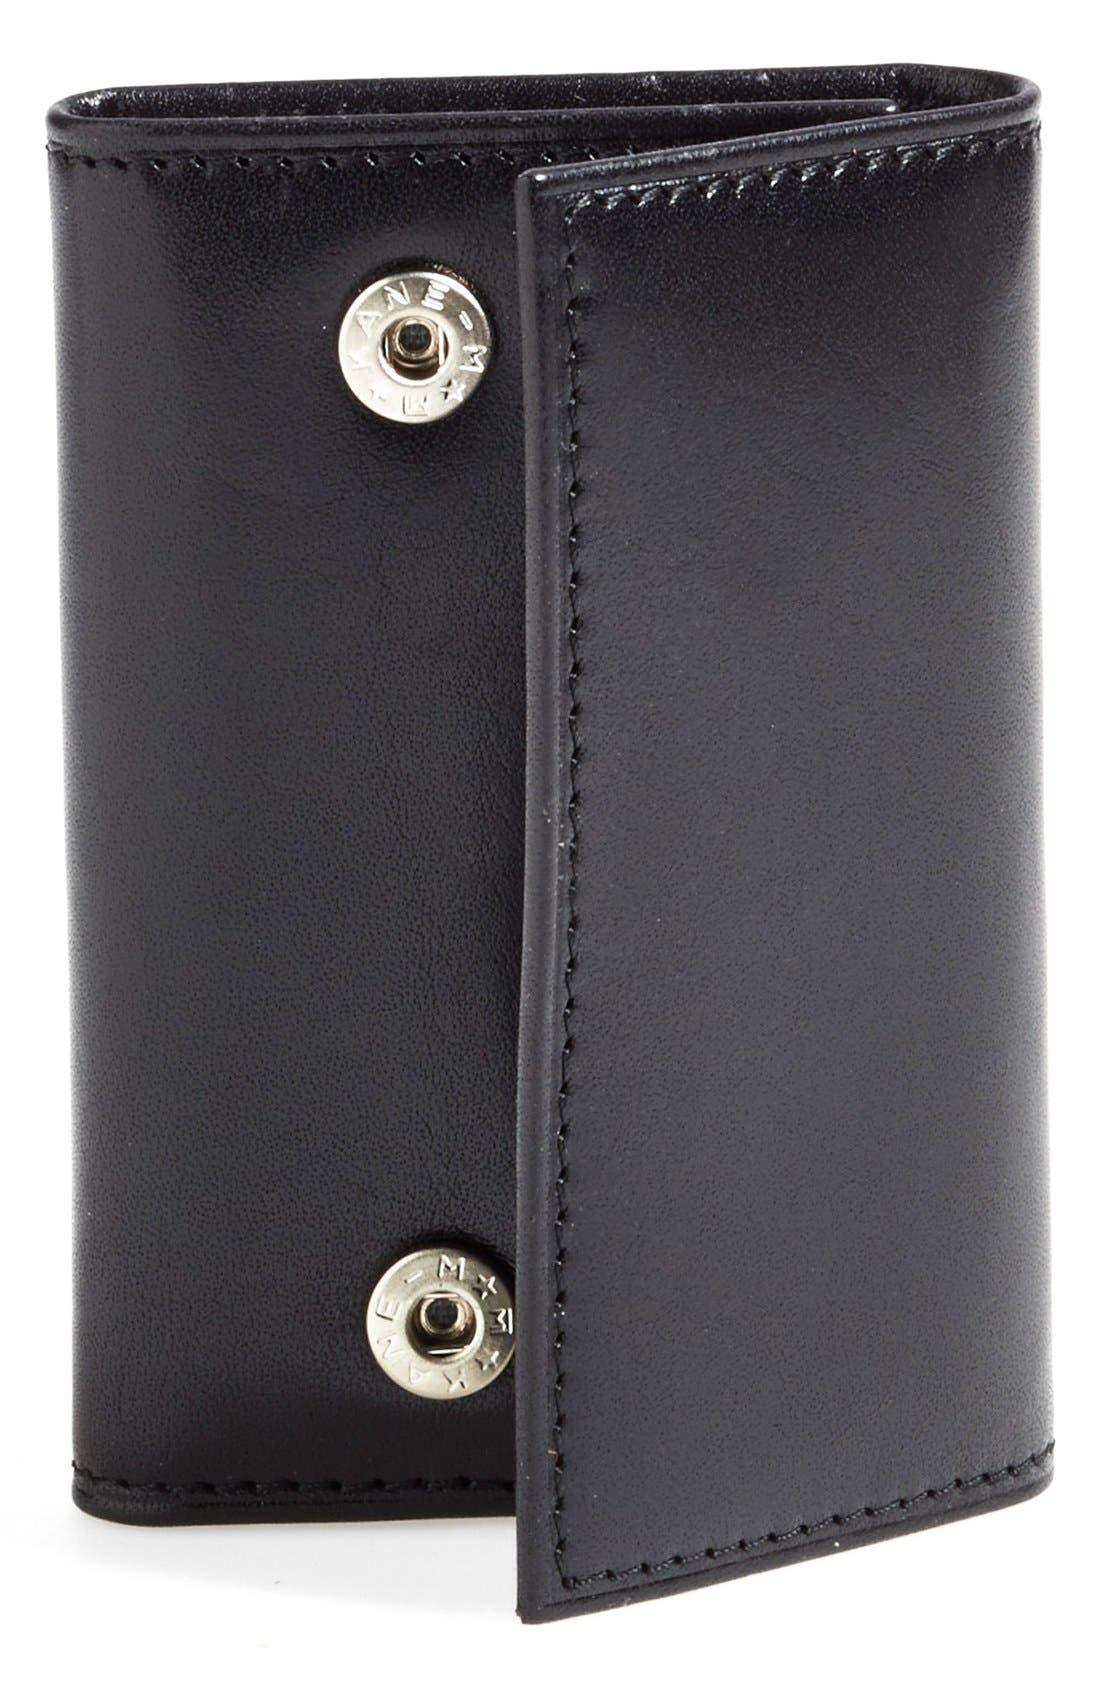 Alternate Image 1 Selected - Bosca 'Old Leather' Key Case